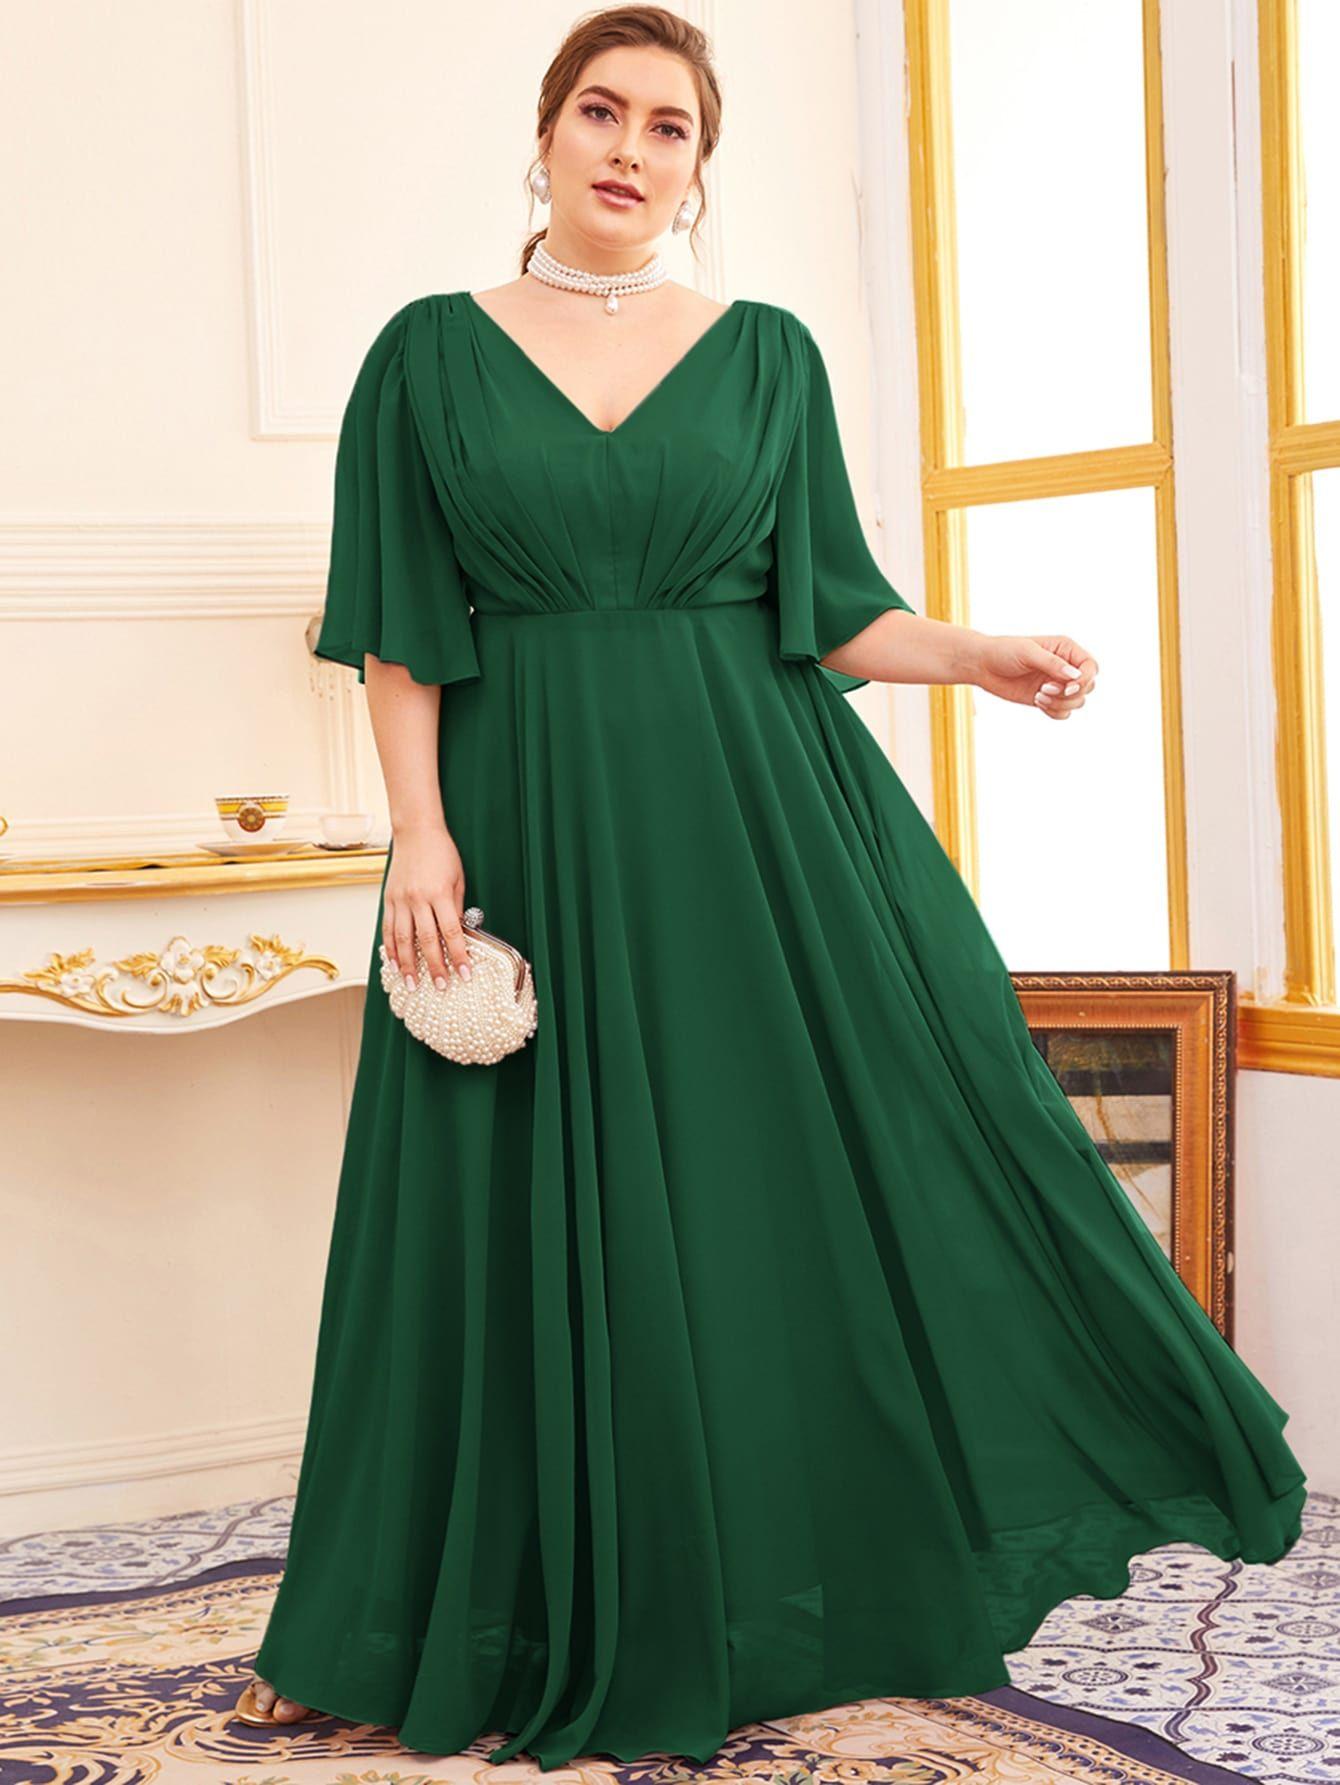 Plus Butterfly Sleeve Double V Neck A Line Dress Shein Usa Dresses Big Size Dress White Dress Party [ 1785 x 1340 Pixel ]